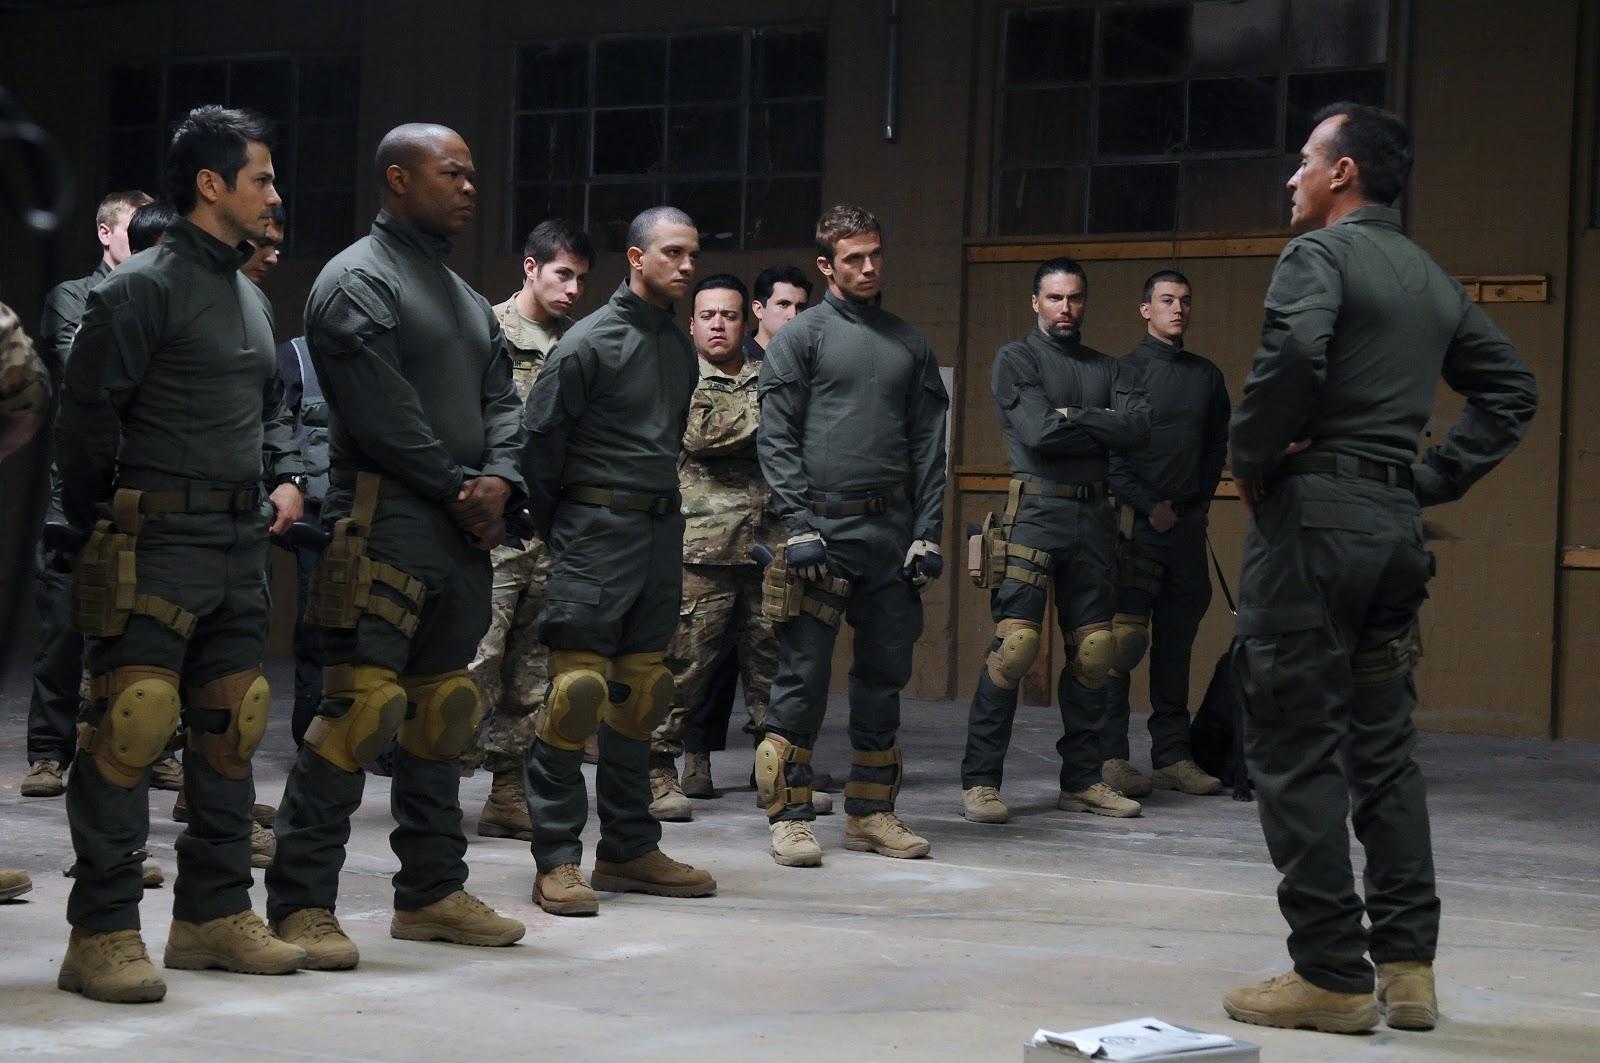 Previewing Seal Team Six: The Raid on Osama bin Laden ... Obama Bin Laden Raid